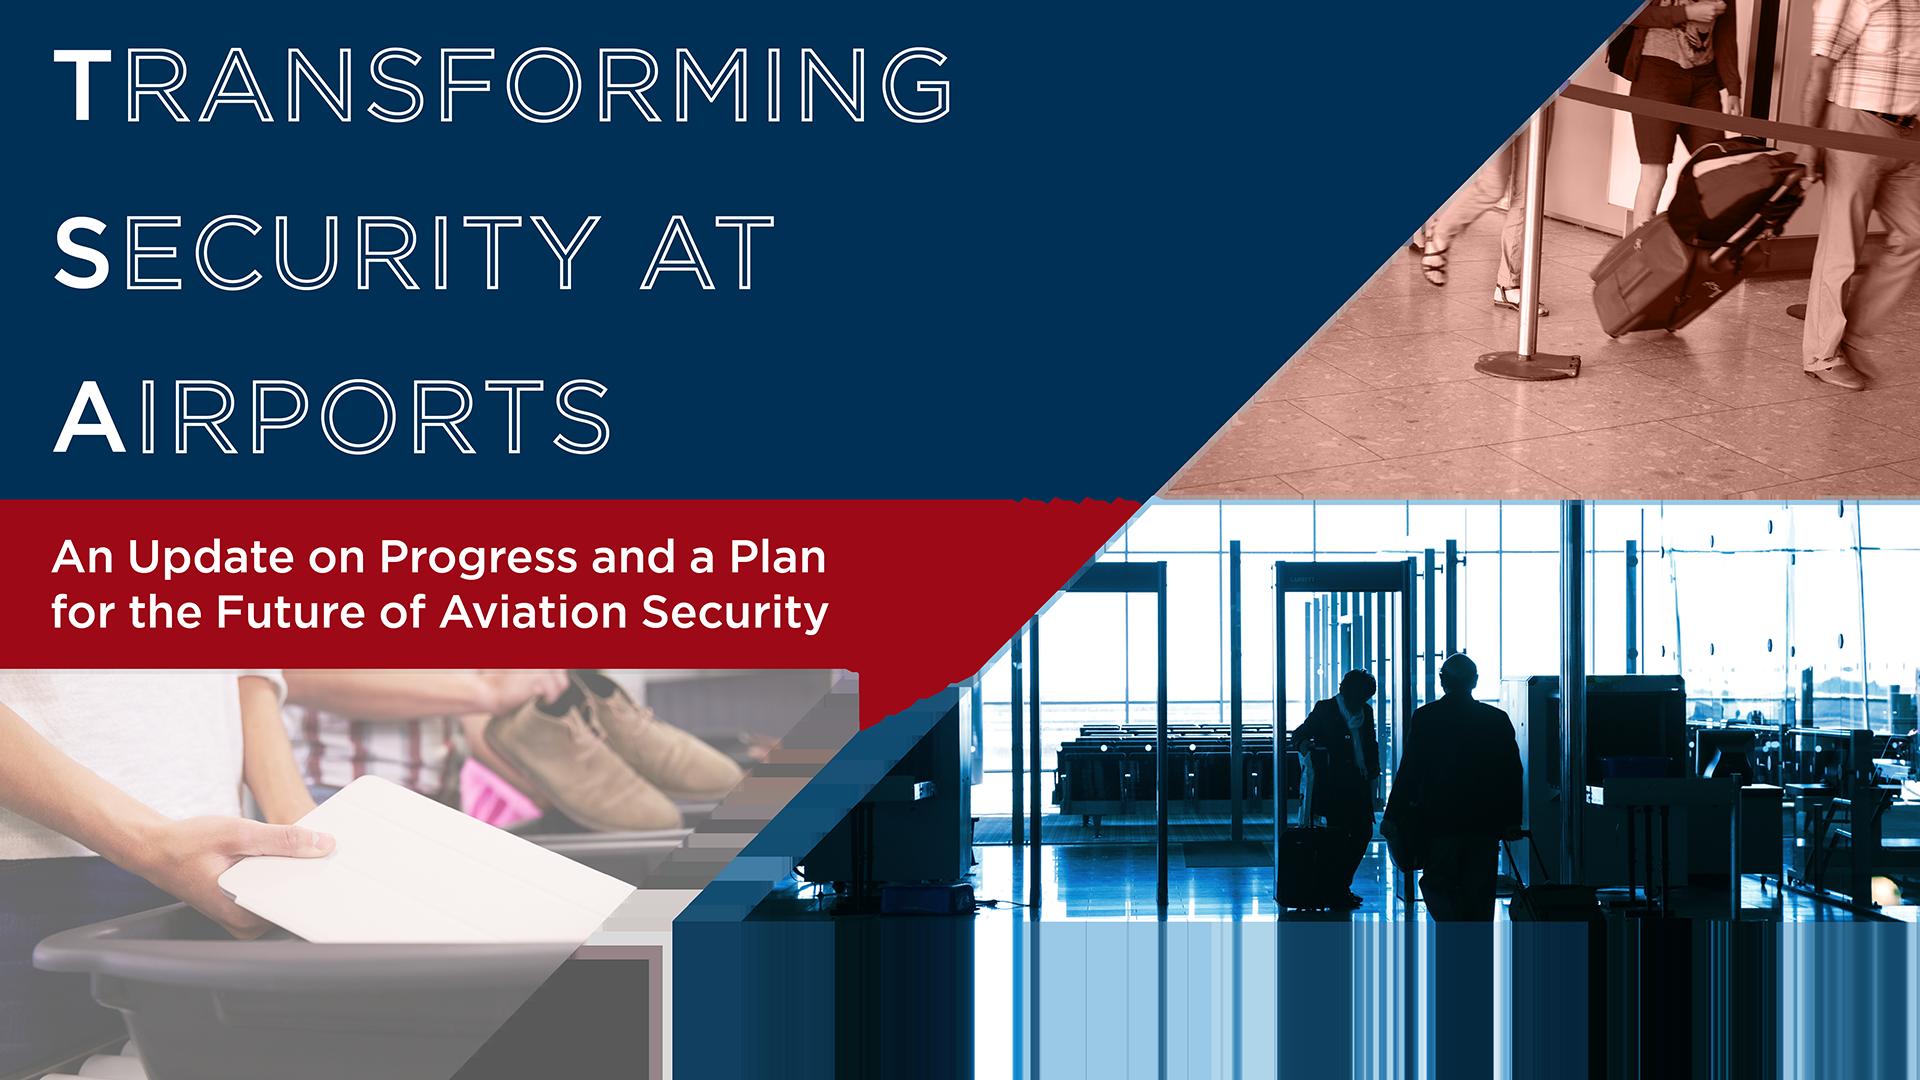 Transforming Security at Airports